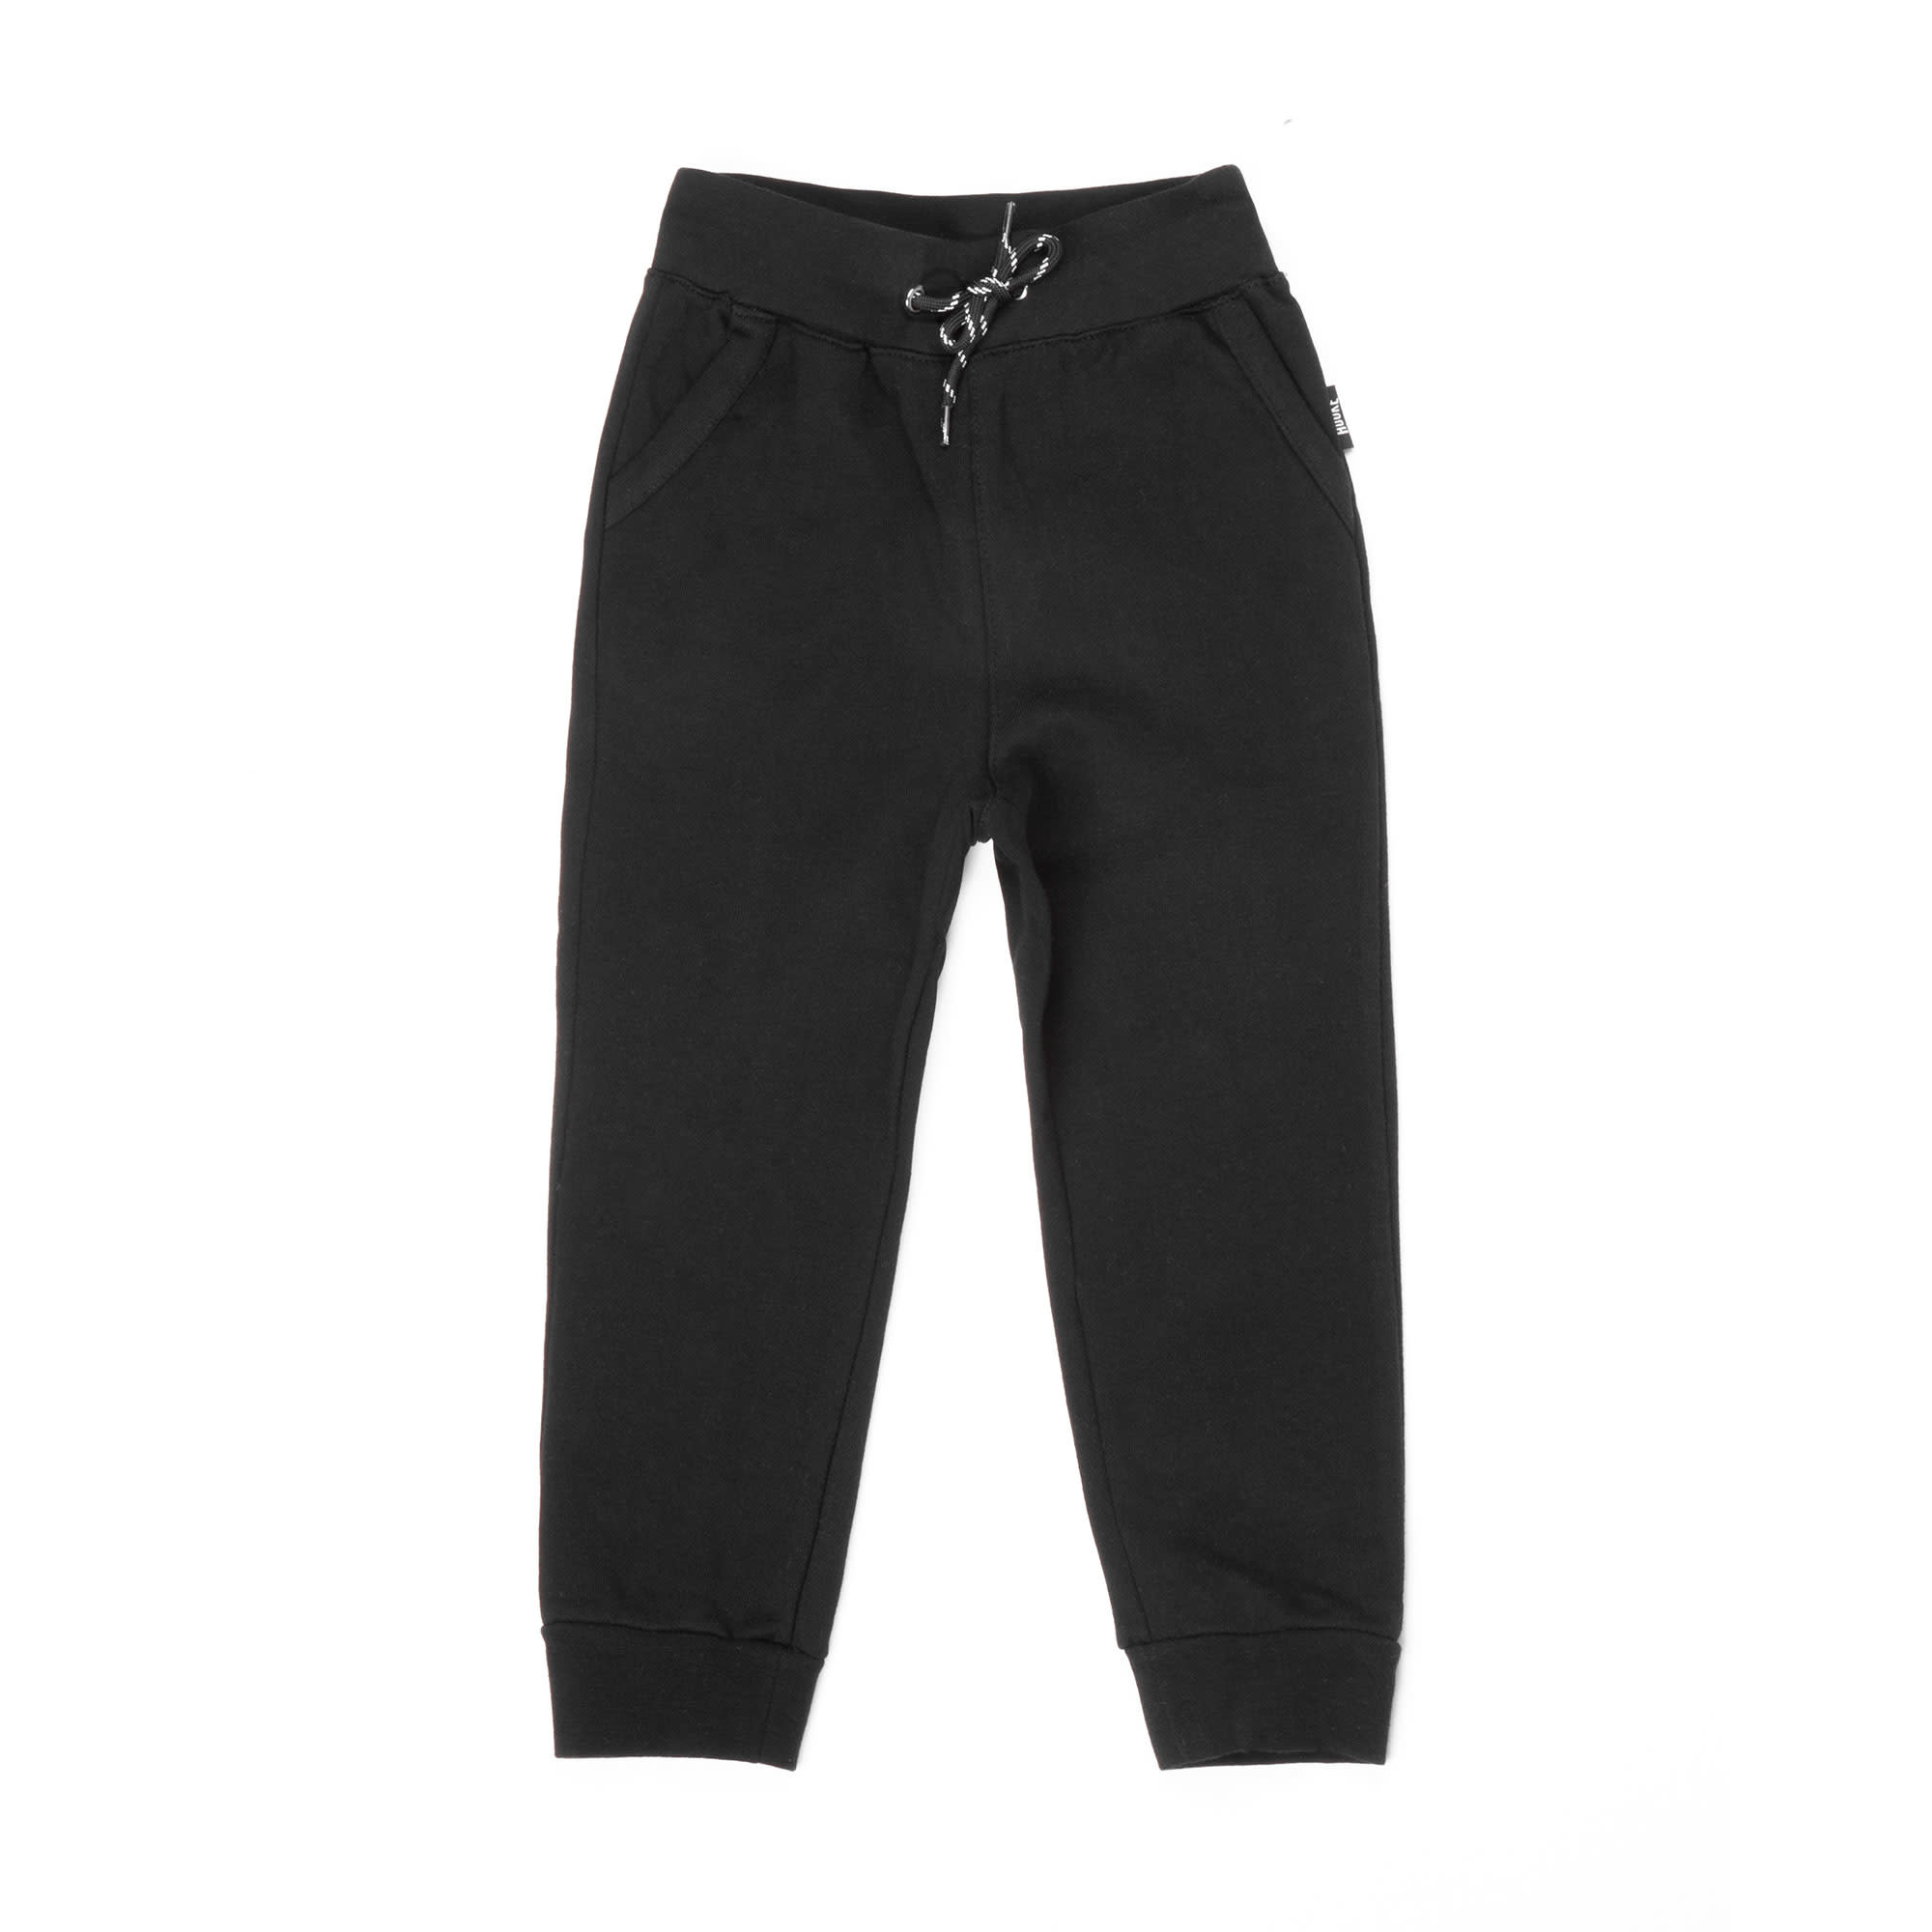 Sweatpants for Kids Black